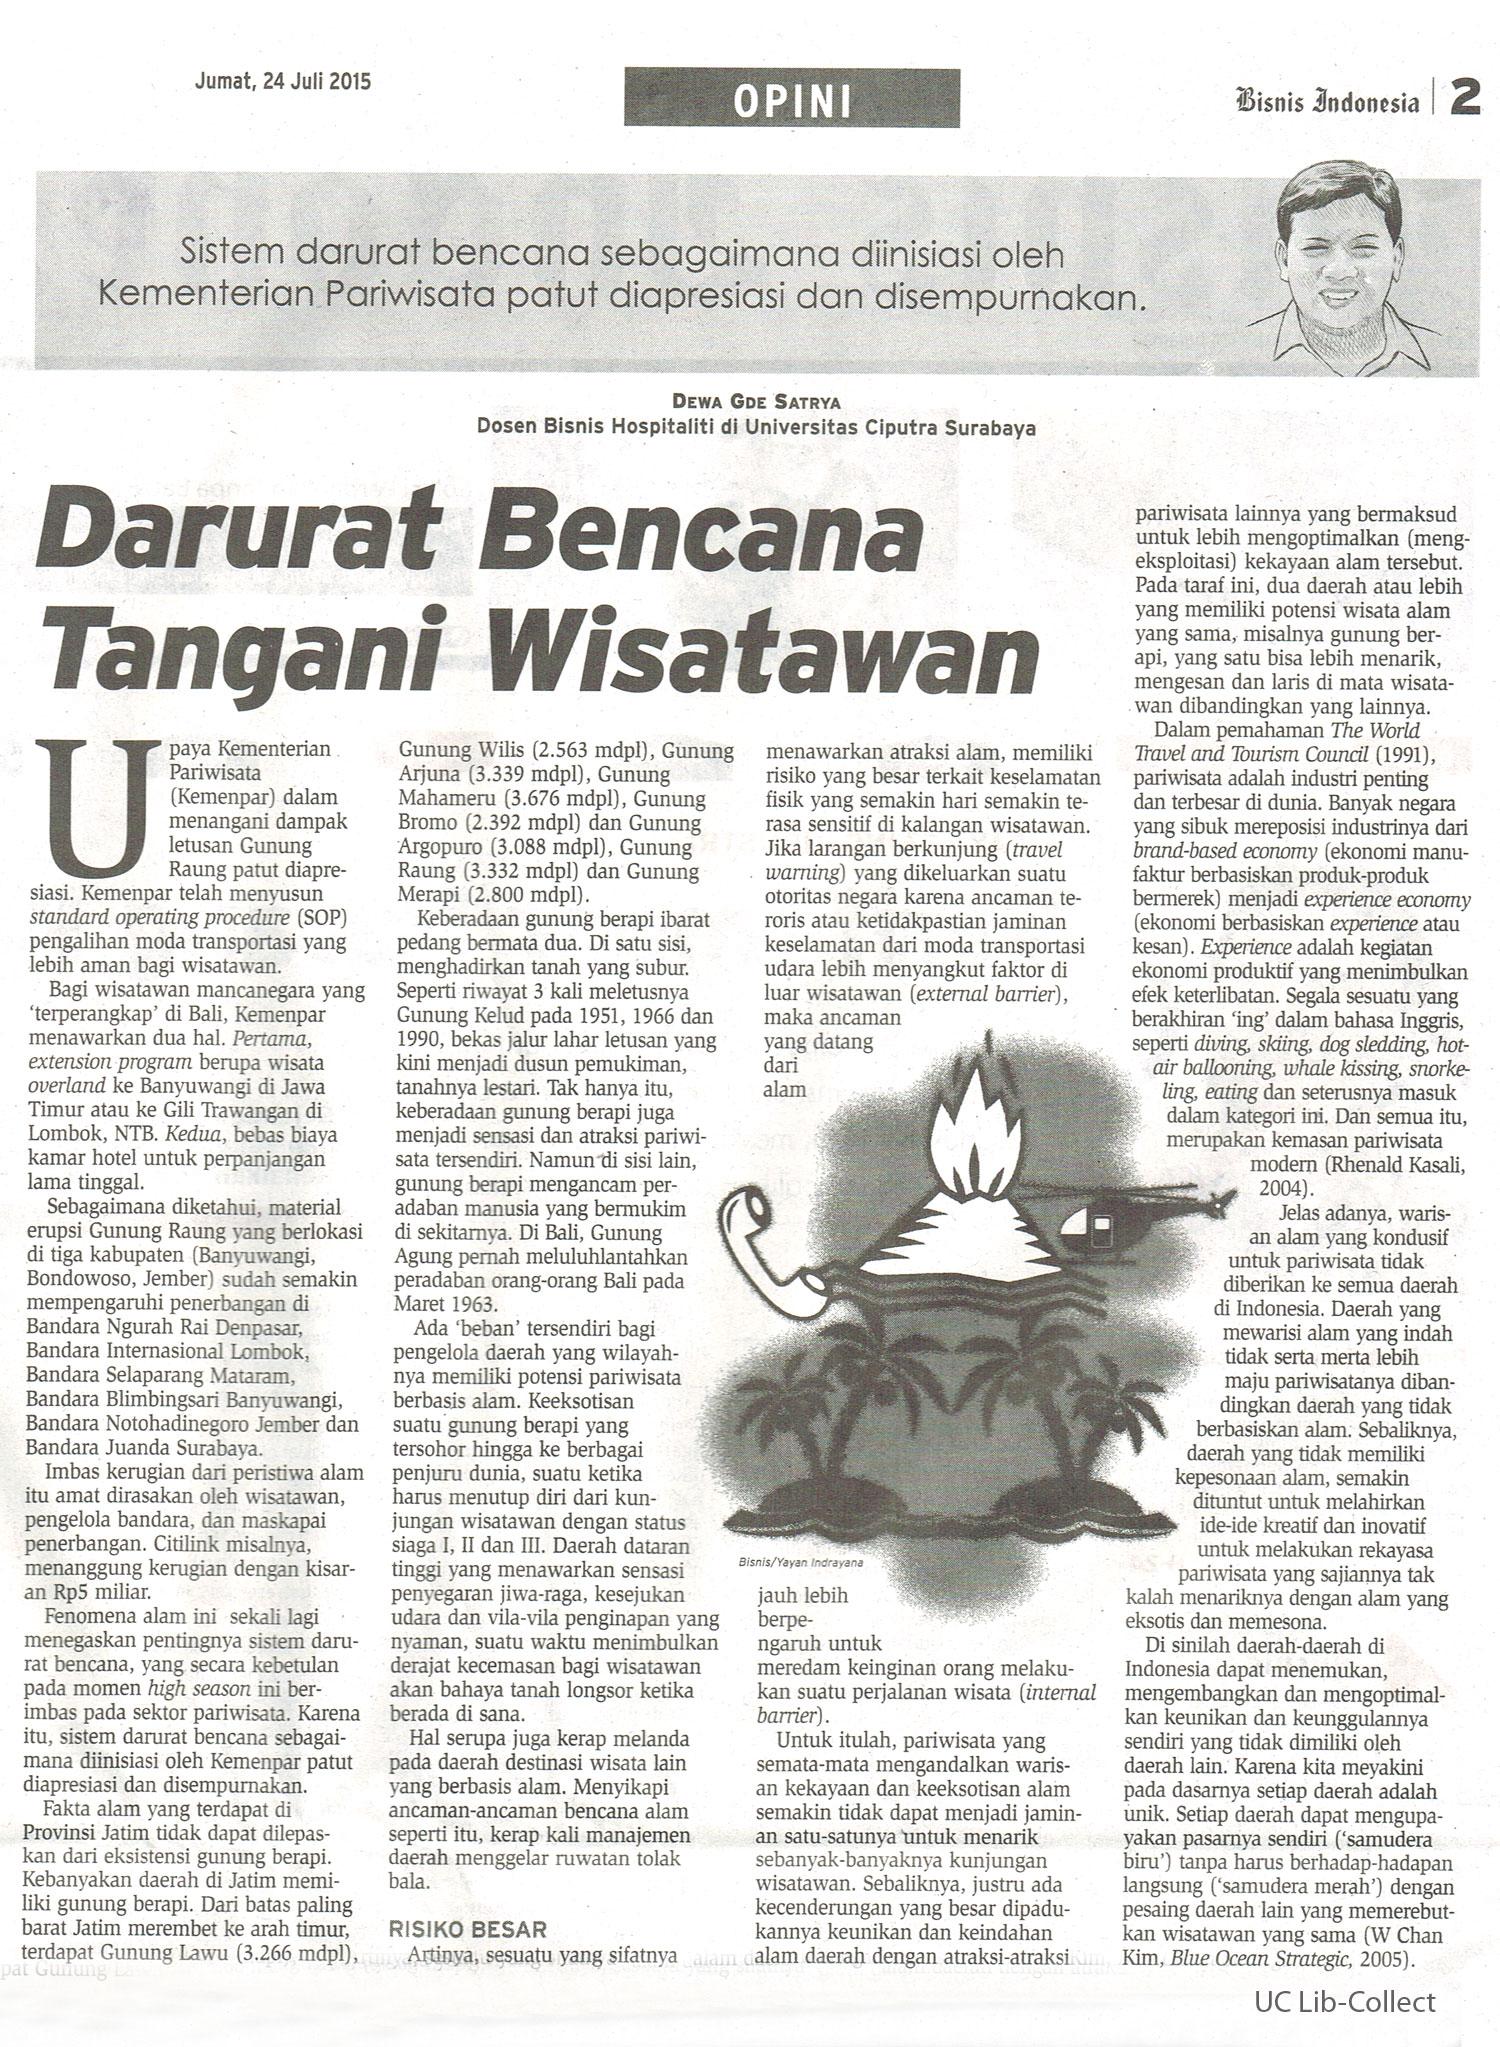 Darurat-Bencana-Tangani-Wisatawan.-Bisnis-Indonesia.-24-Juli-2015.Hal.2